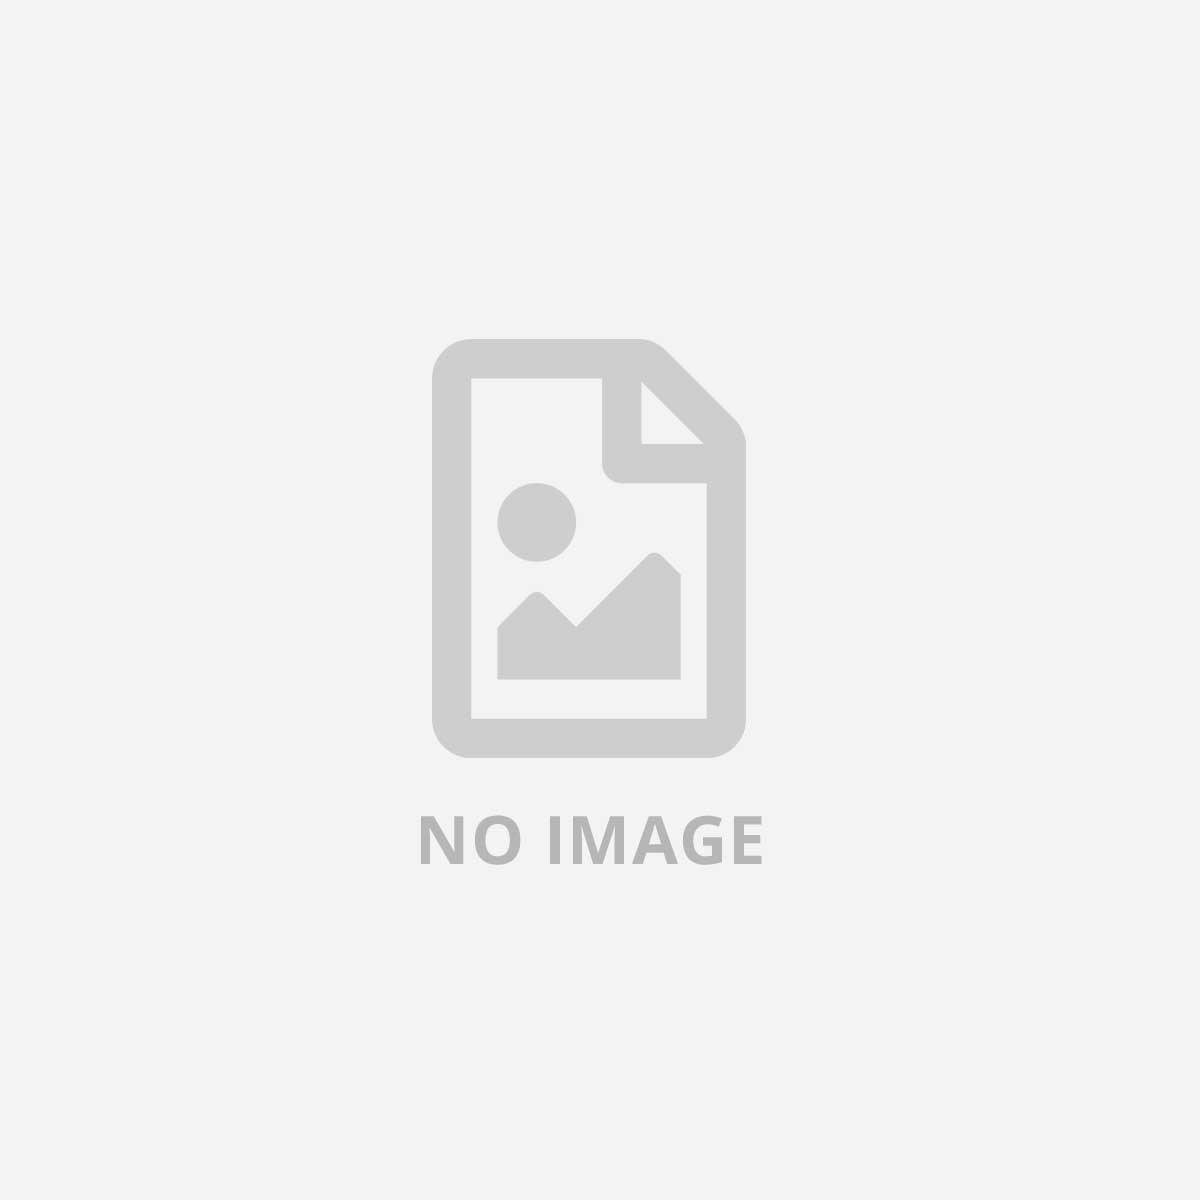 NILOX MINI WI-FI 3